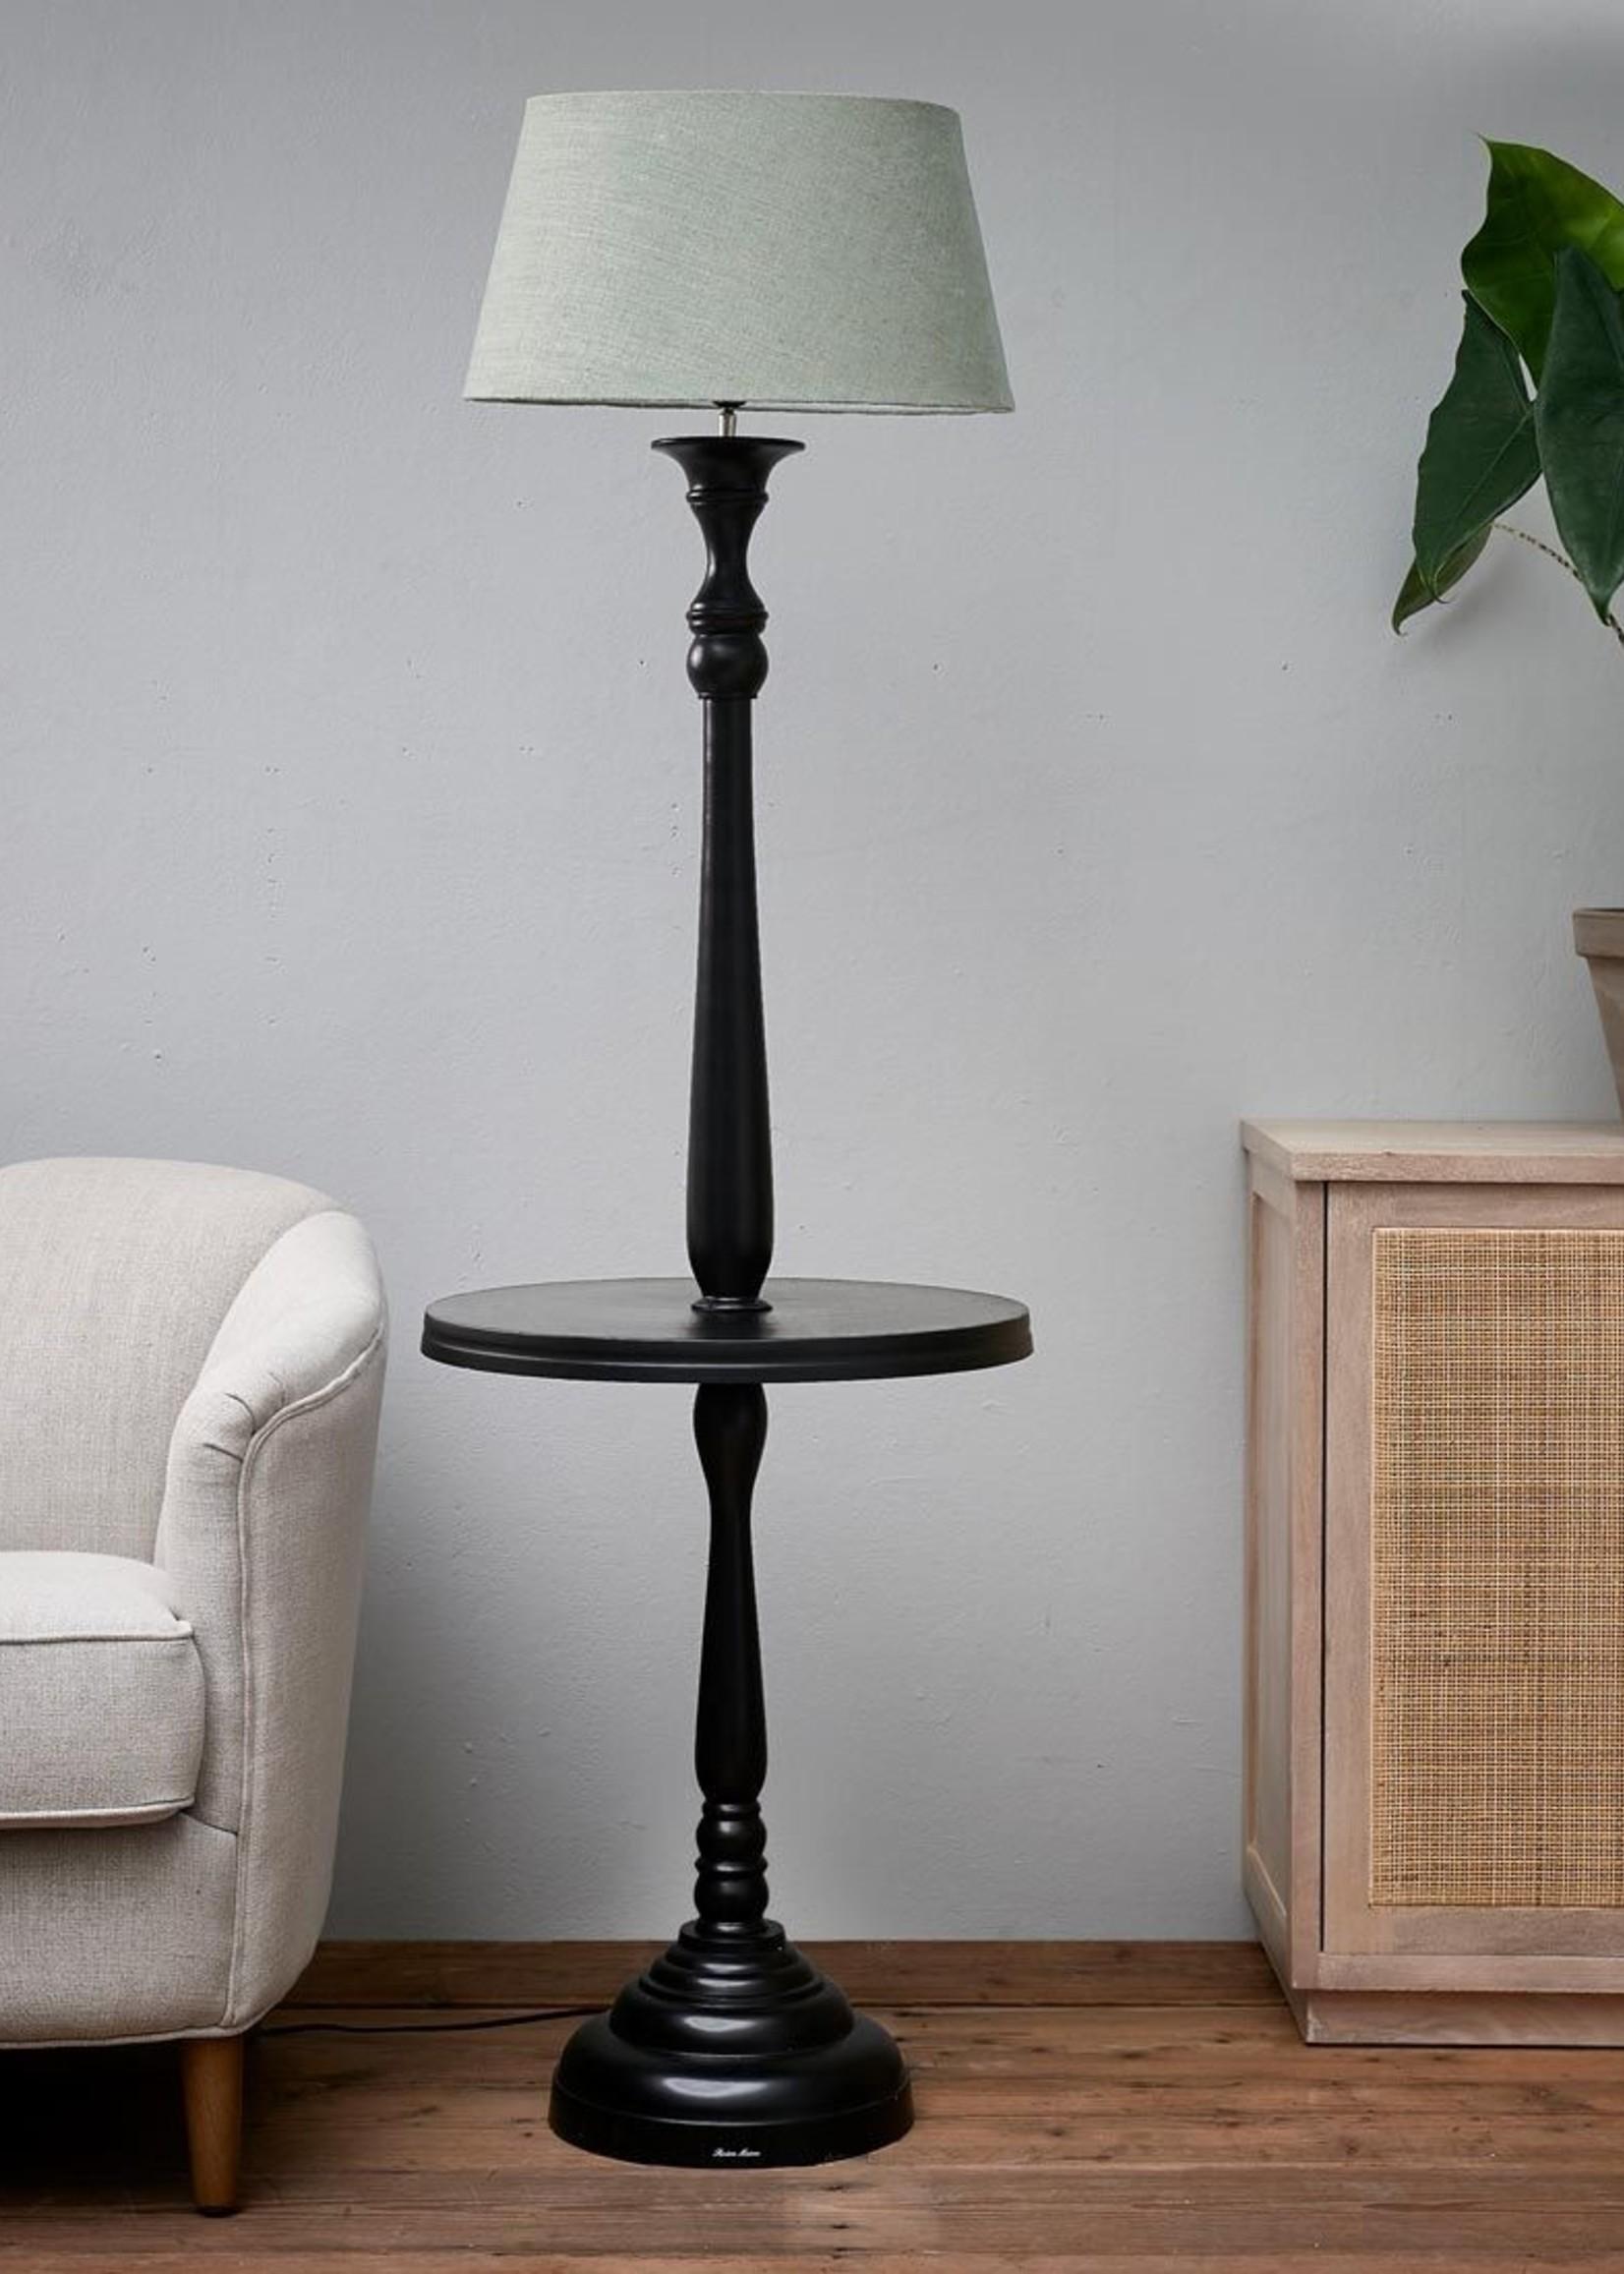 Riviera Maison Clareridge Floor Lamp black